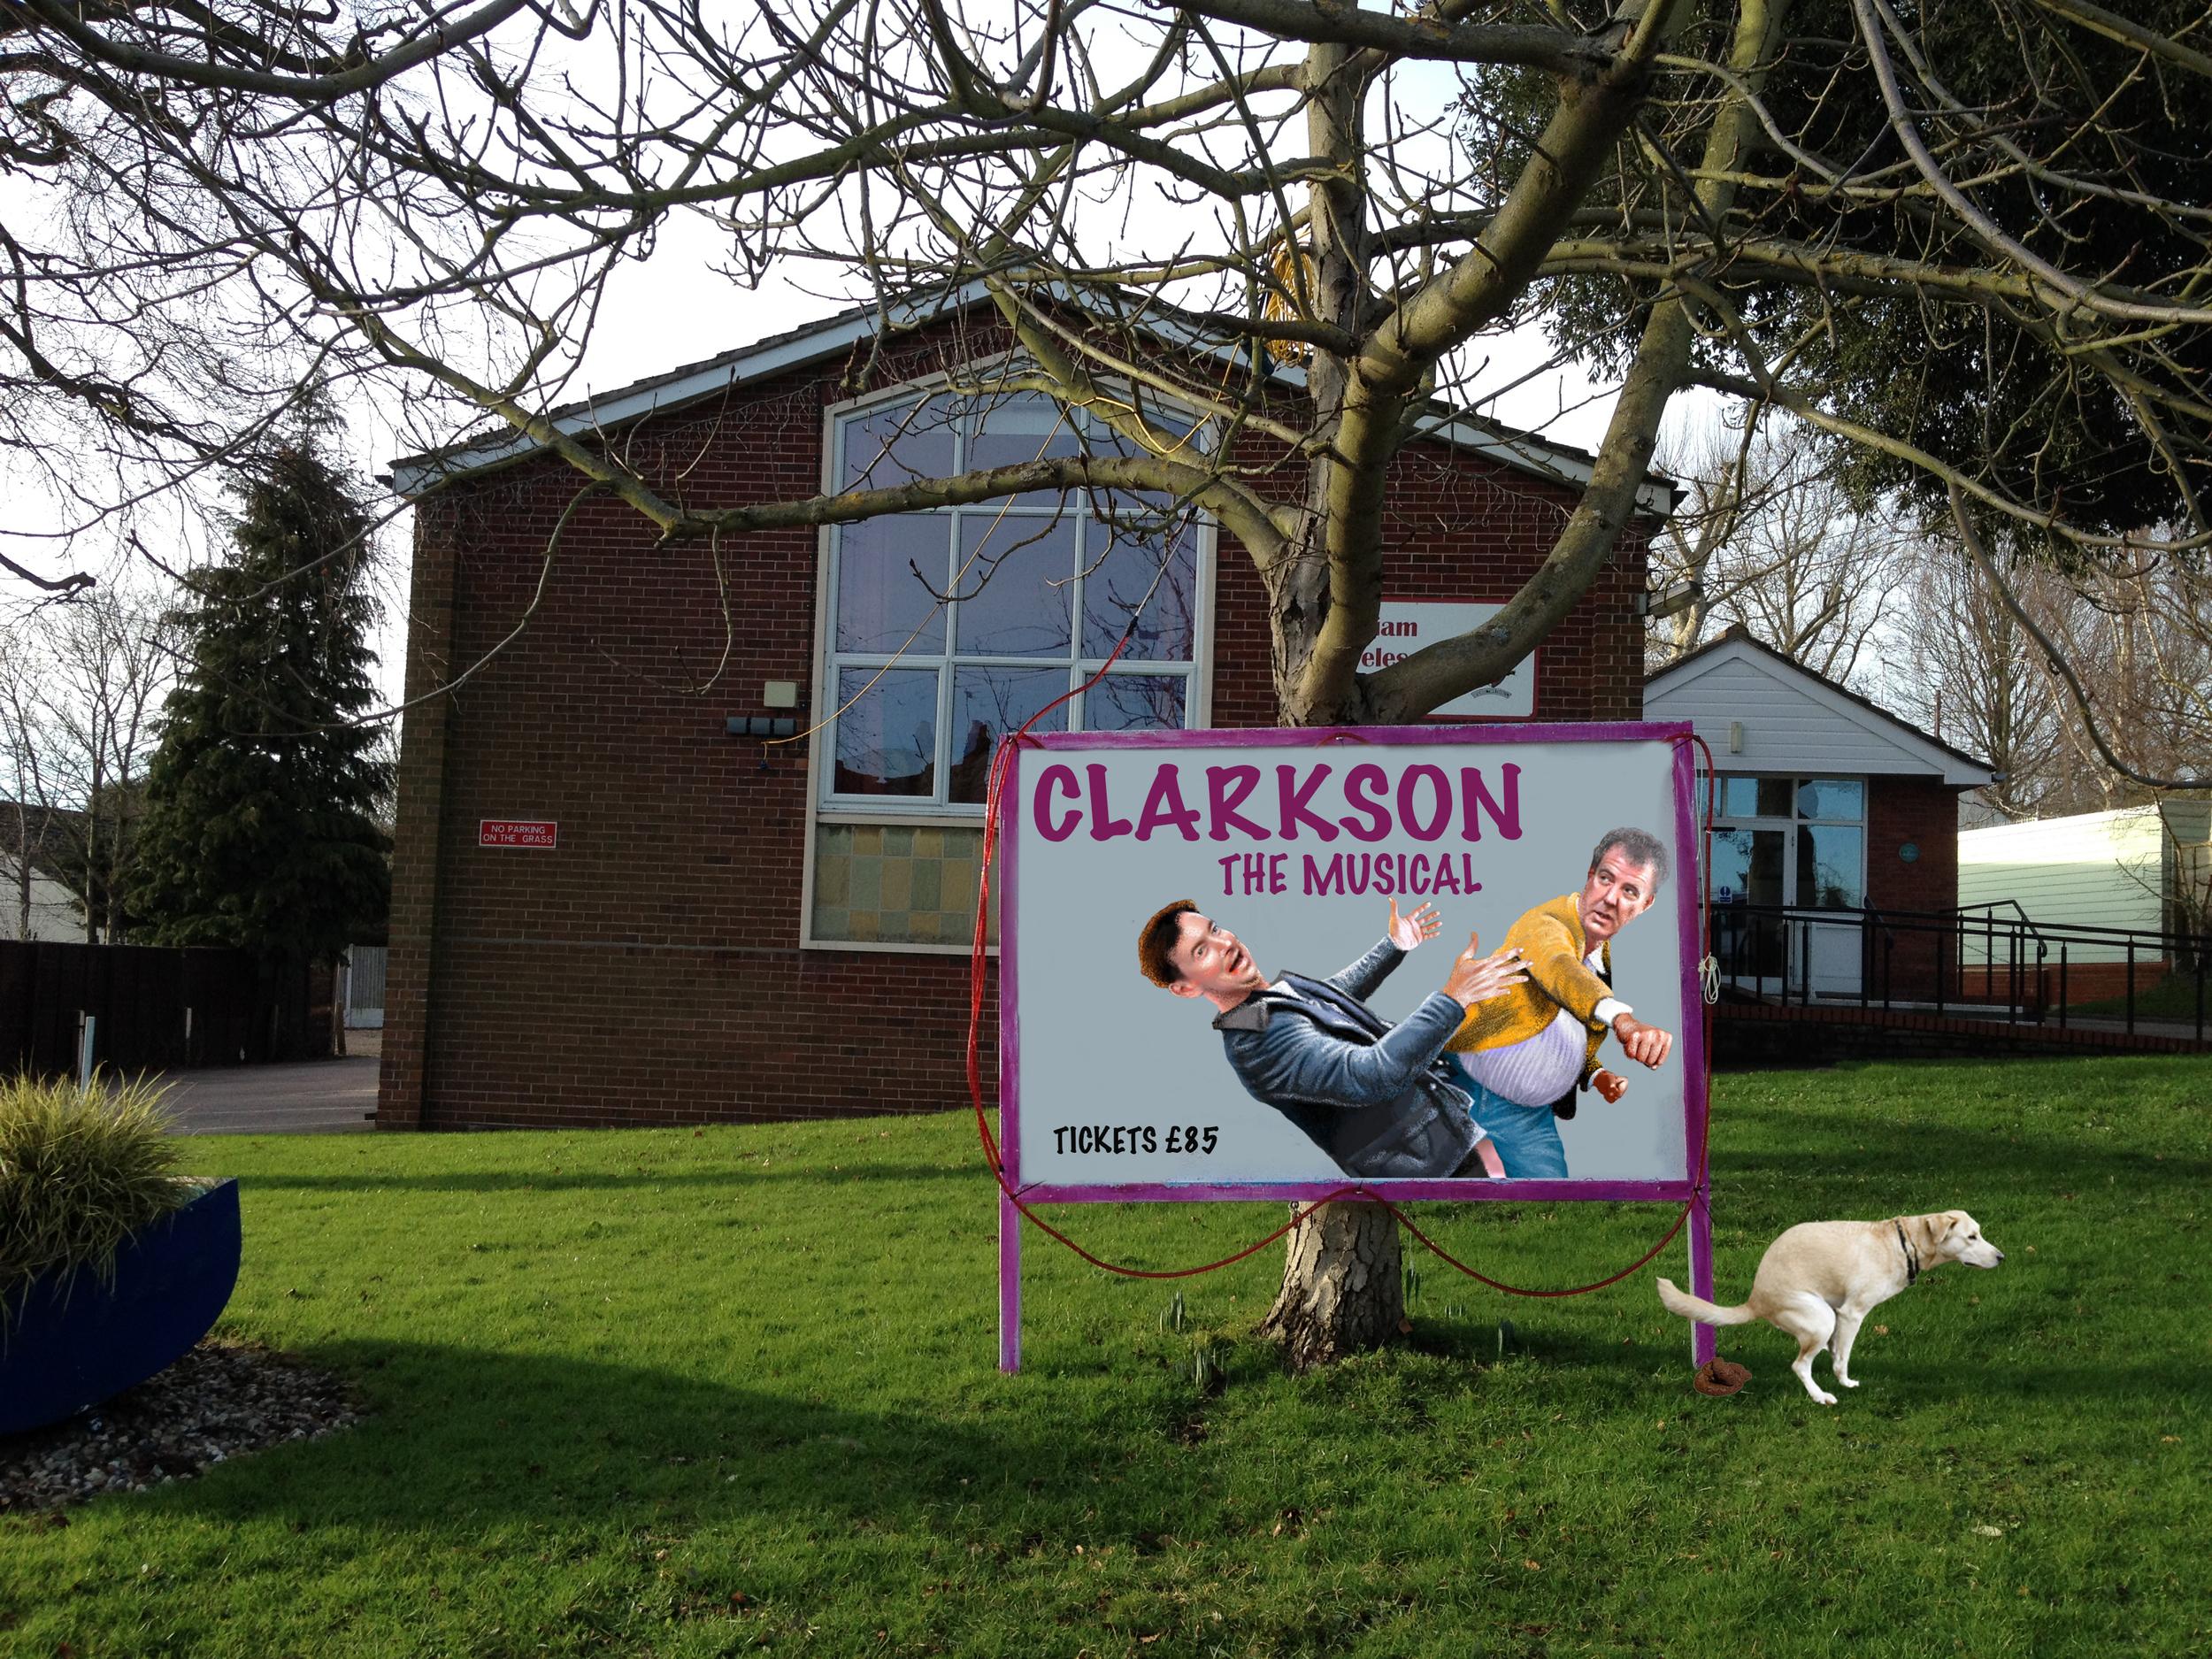 Clarkson the musical